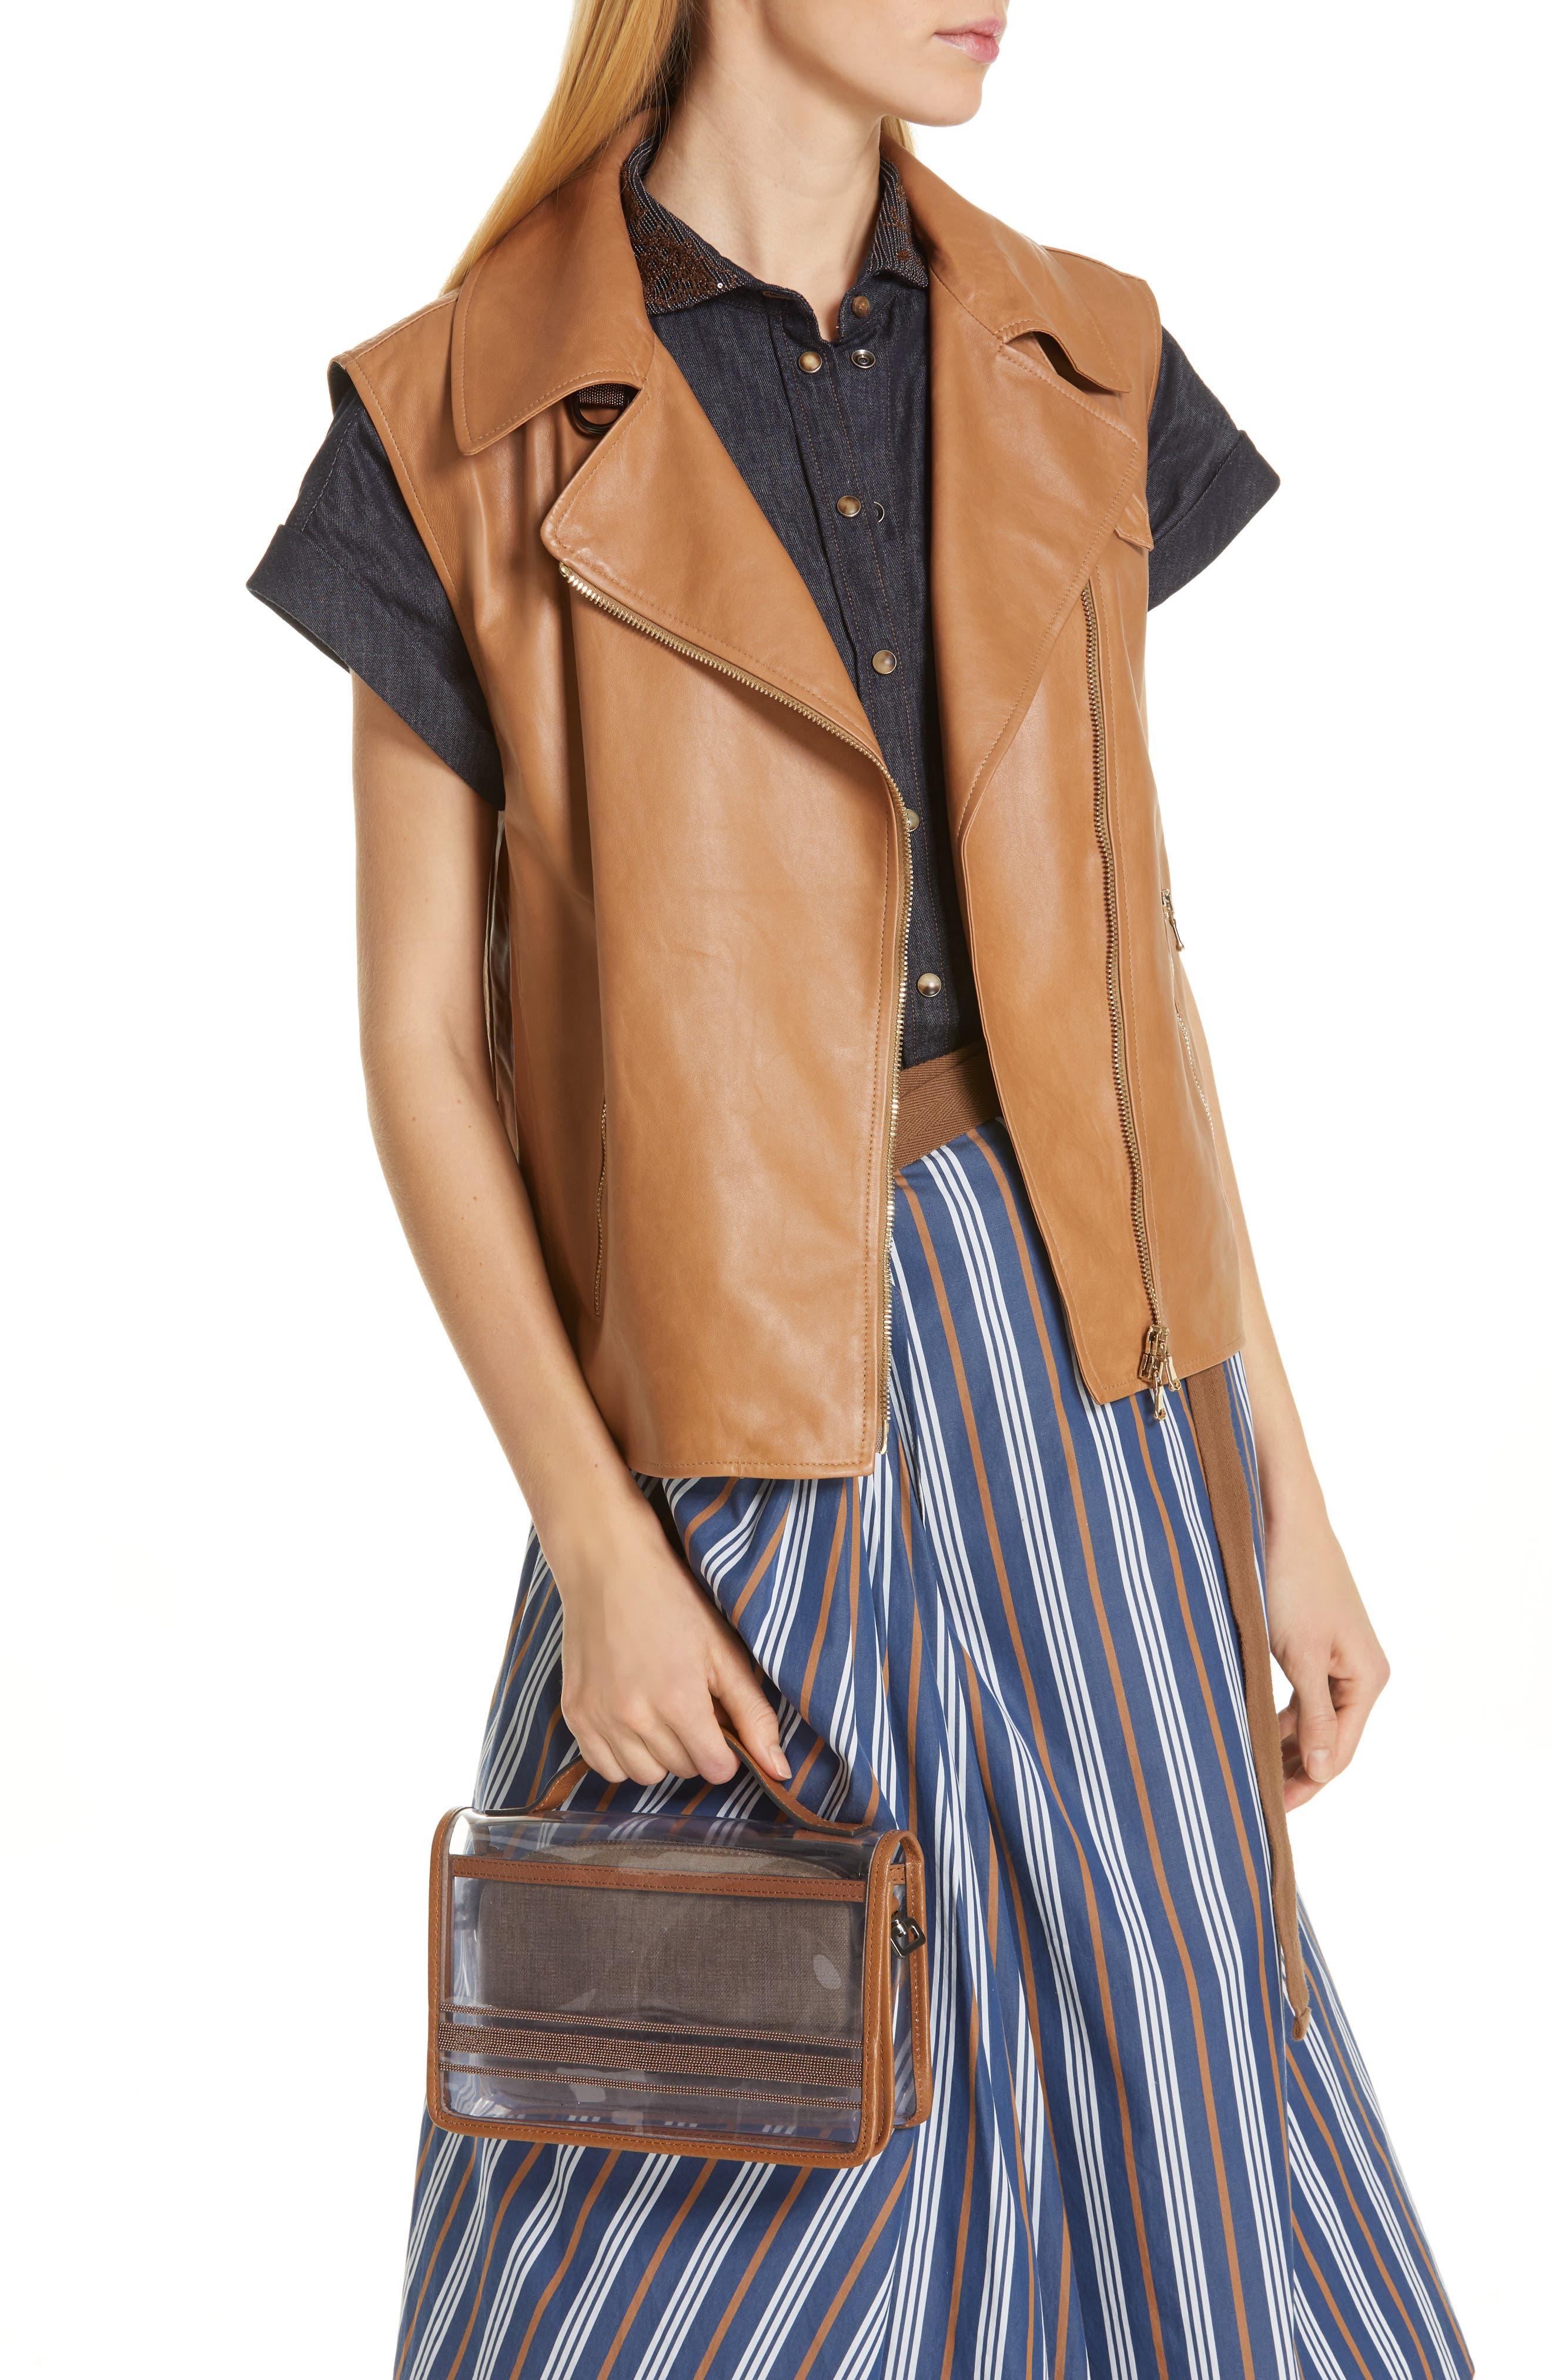 BRUNELLO CUCINELLI, Monili & Leather Trim Clear Shoulder Bag, Alternate thumbnail 2, color, LT BROWN